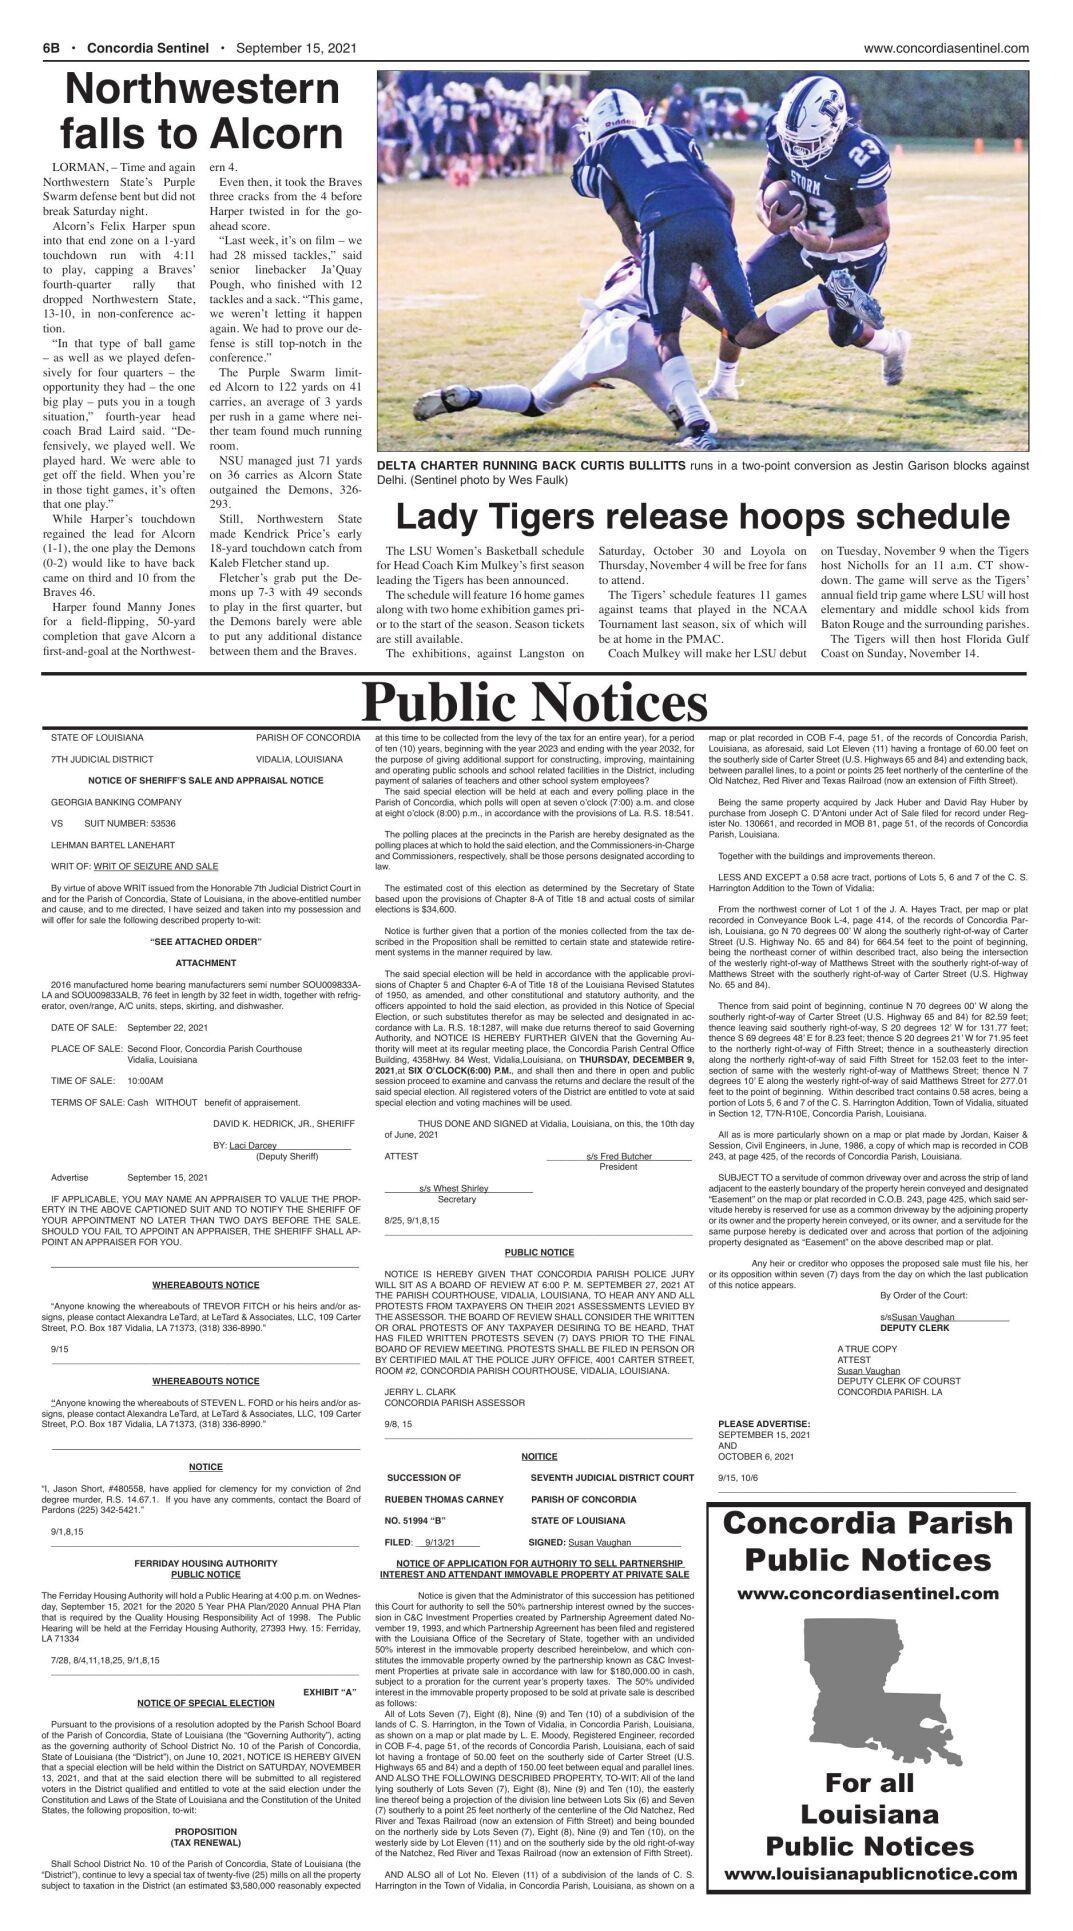 Public Notices - September 15, 2021